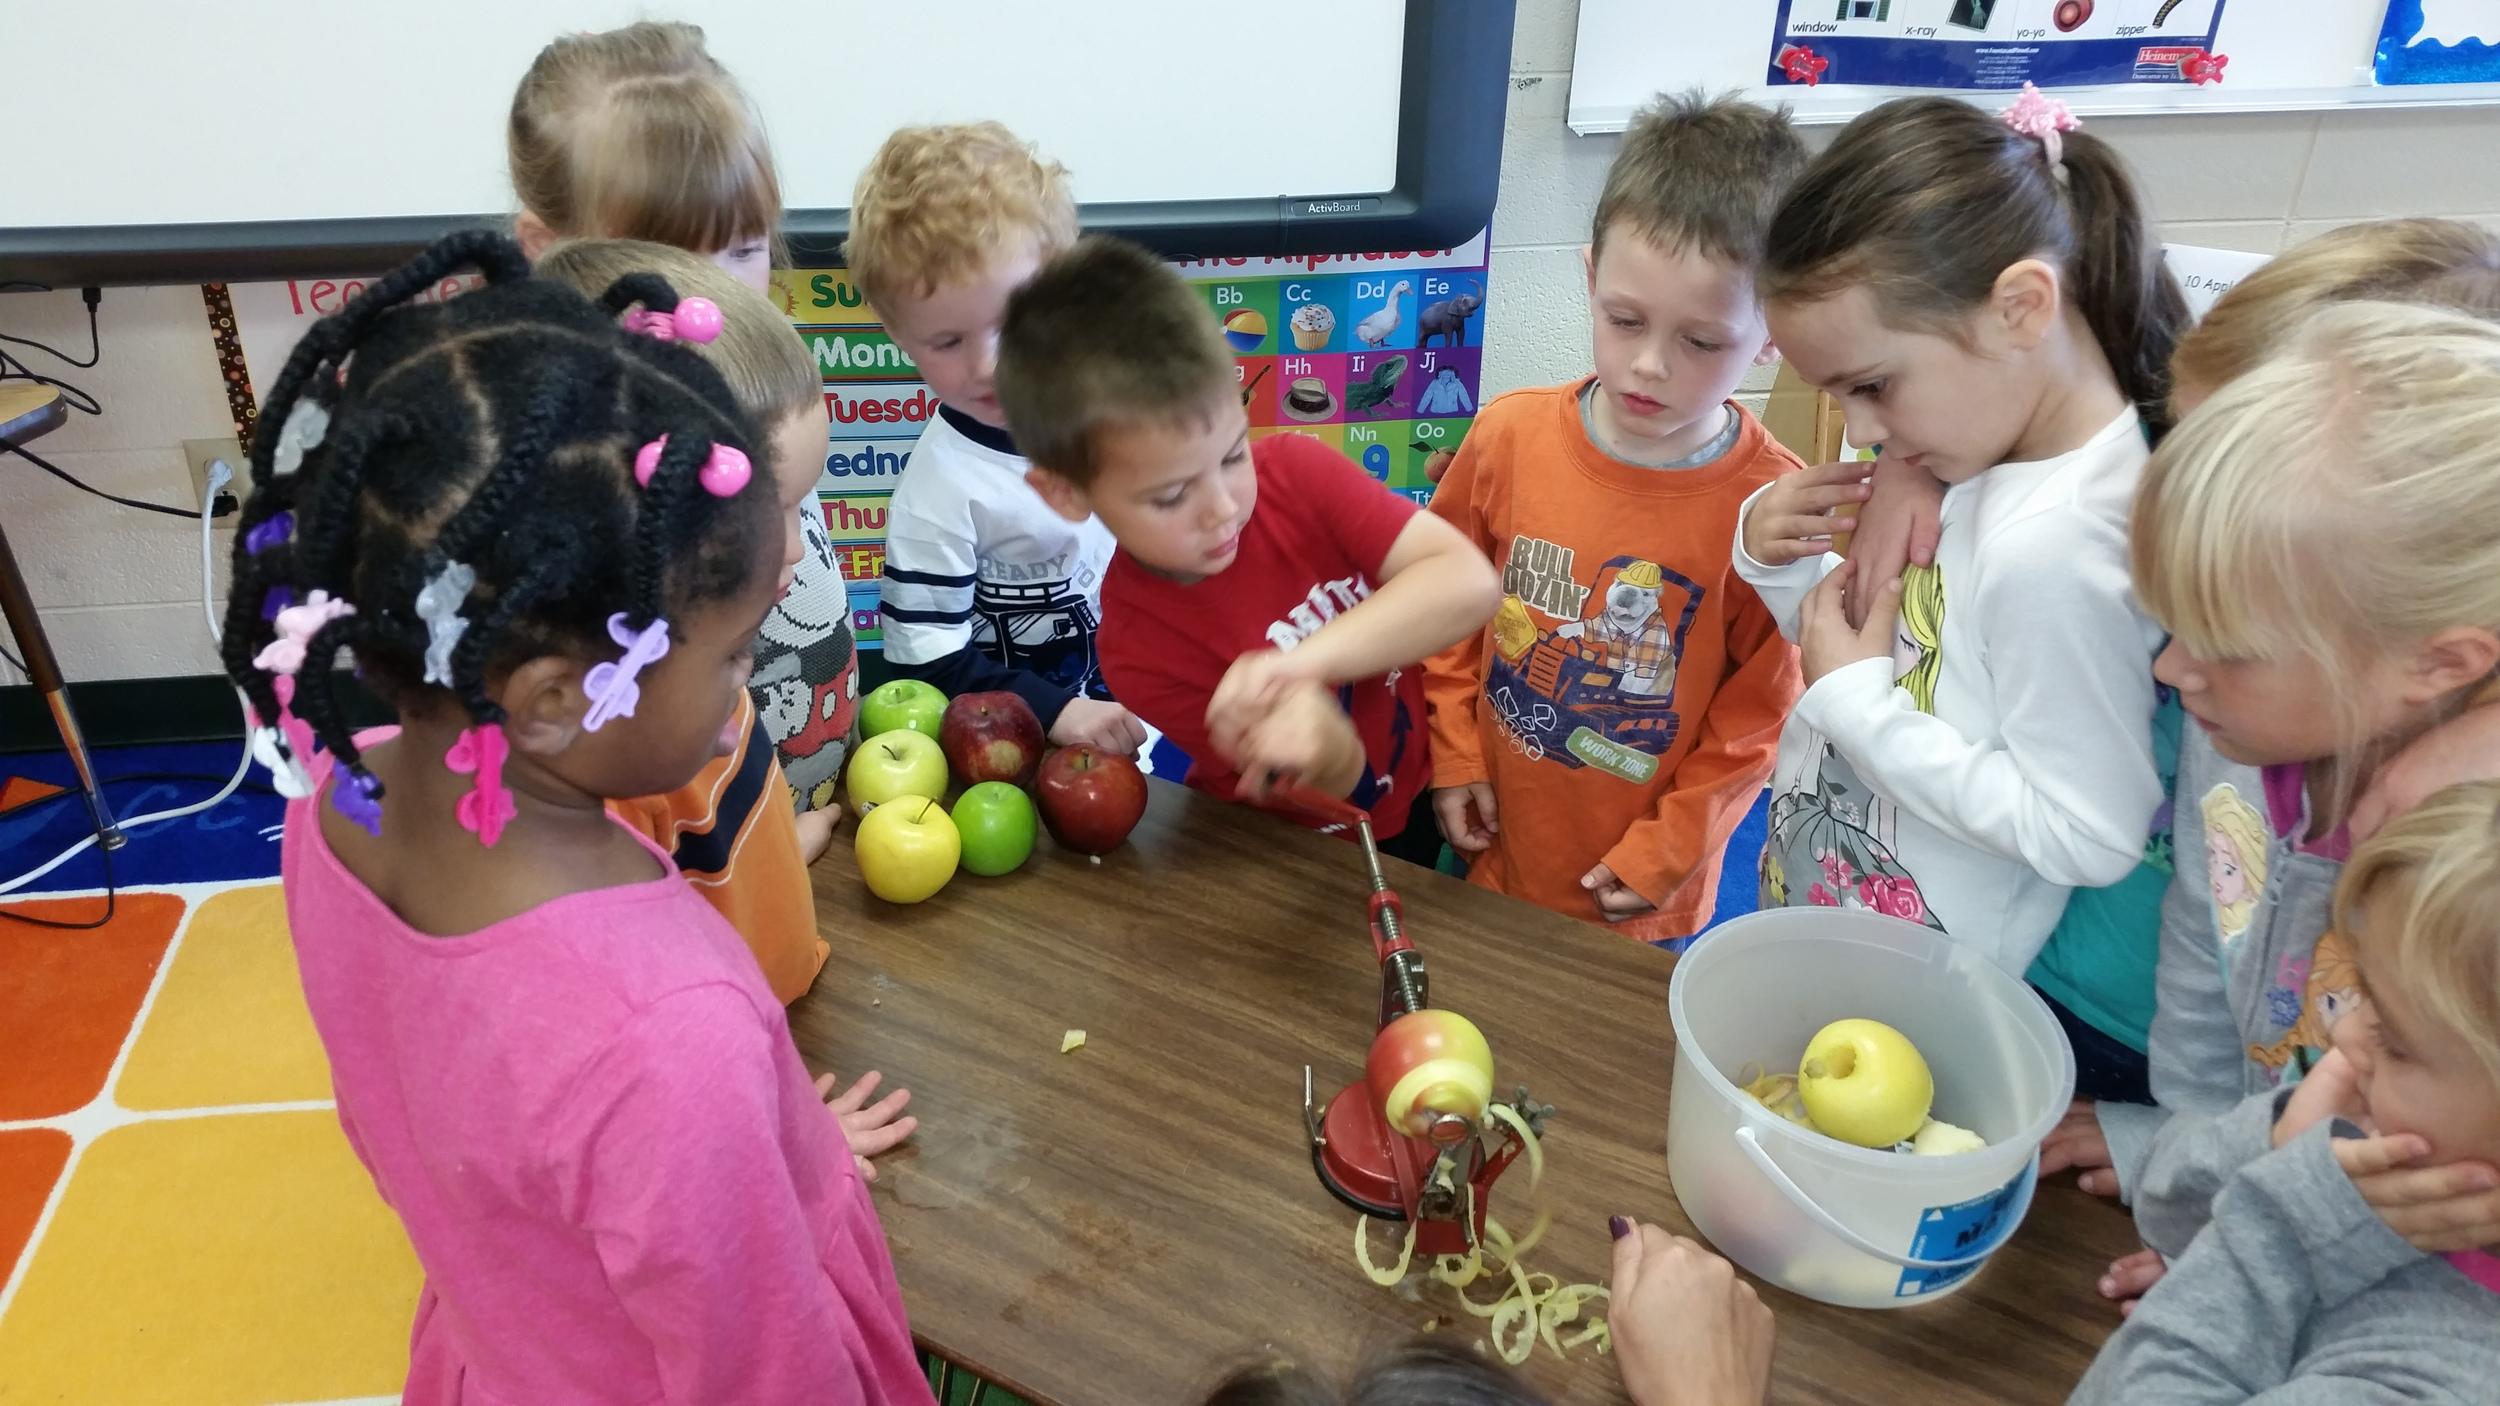 Peeling the apples